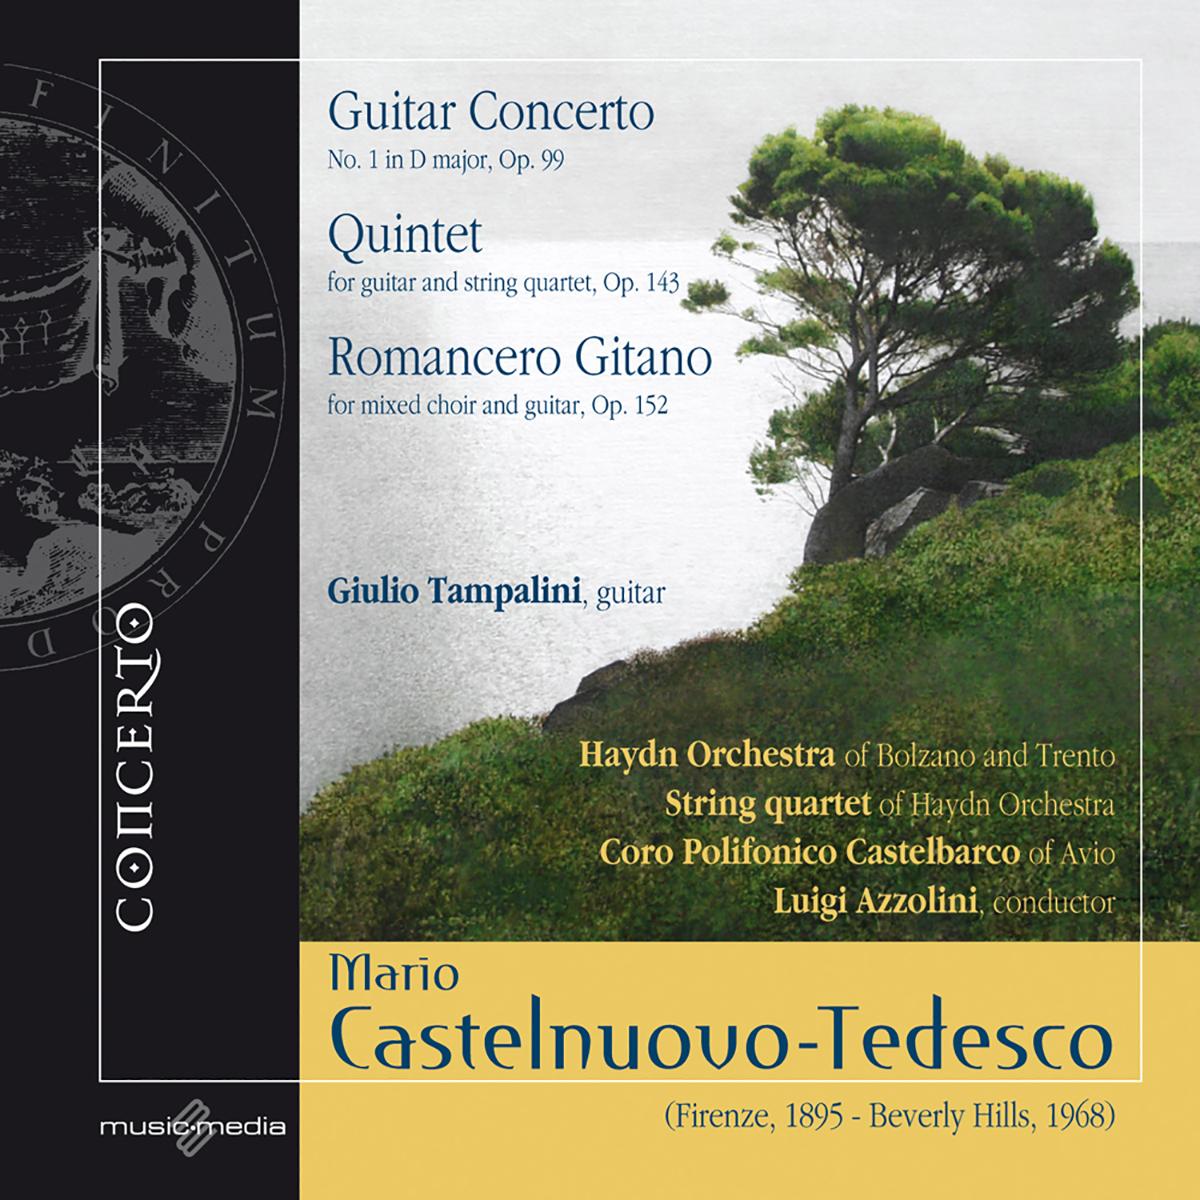 Mario Castelnuovo - Tedesco